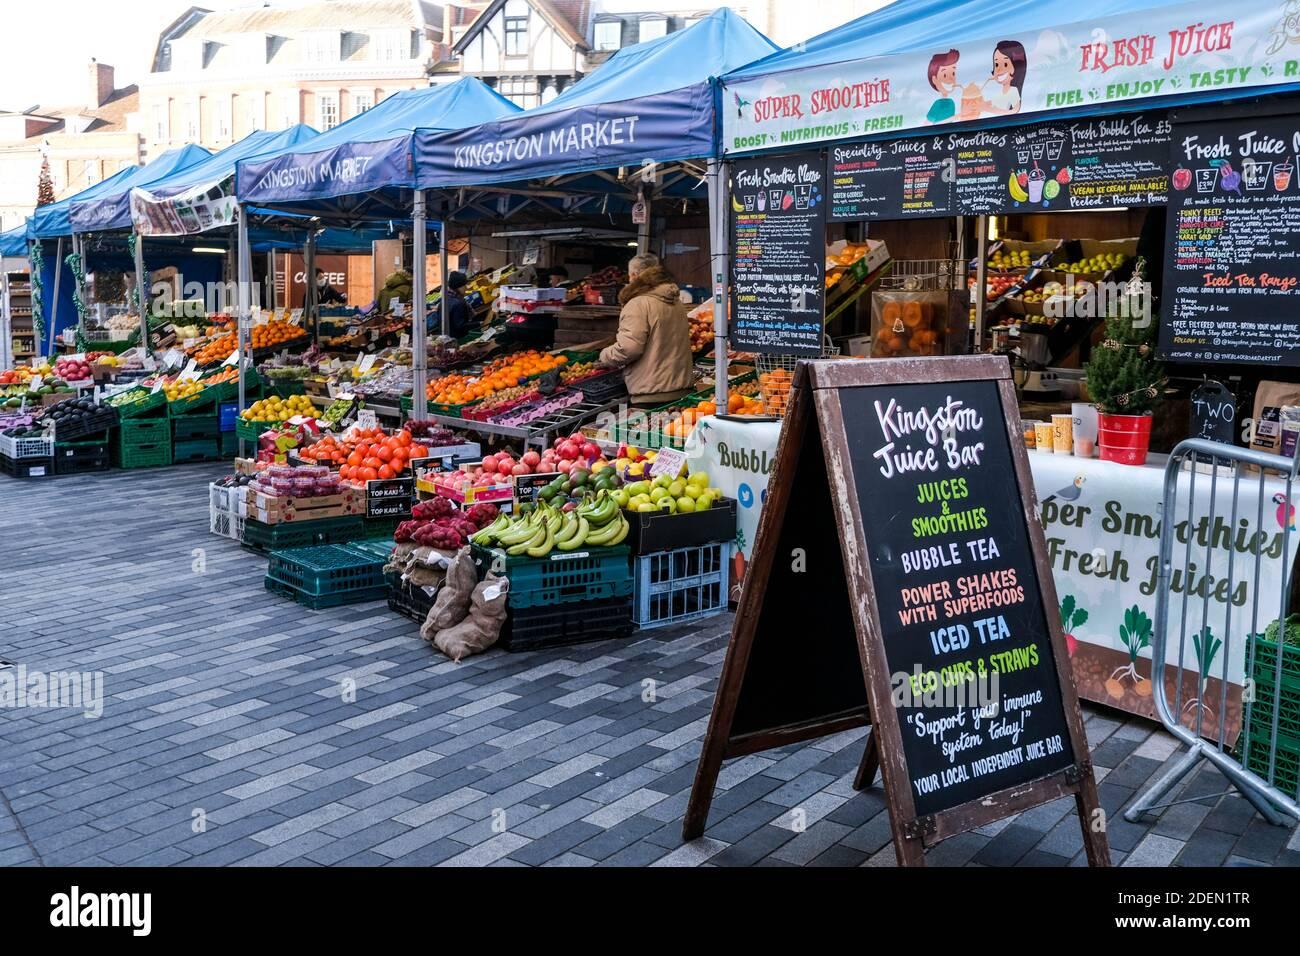 London UK, December 01 2020, Market Traders Selling Fresh Fruit And Vegetables During COVID-19 Lockdown Stock Photo